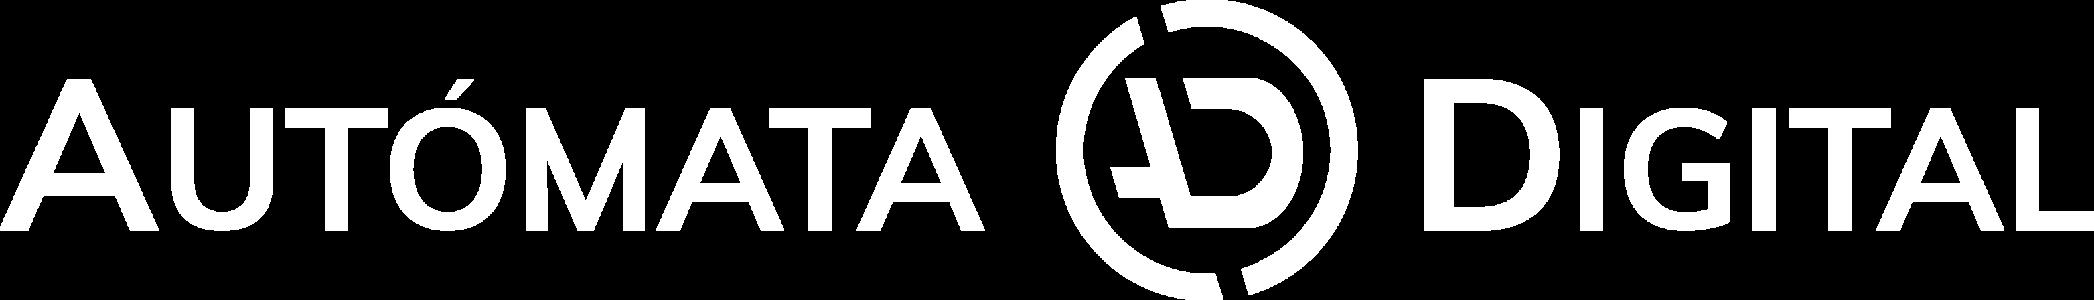 Logo autómata digital blanco